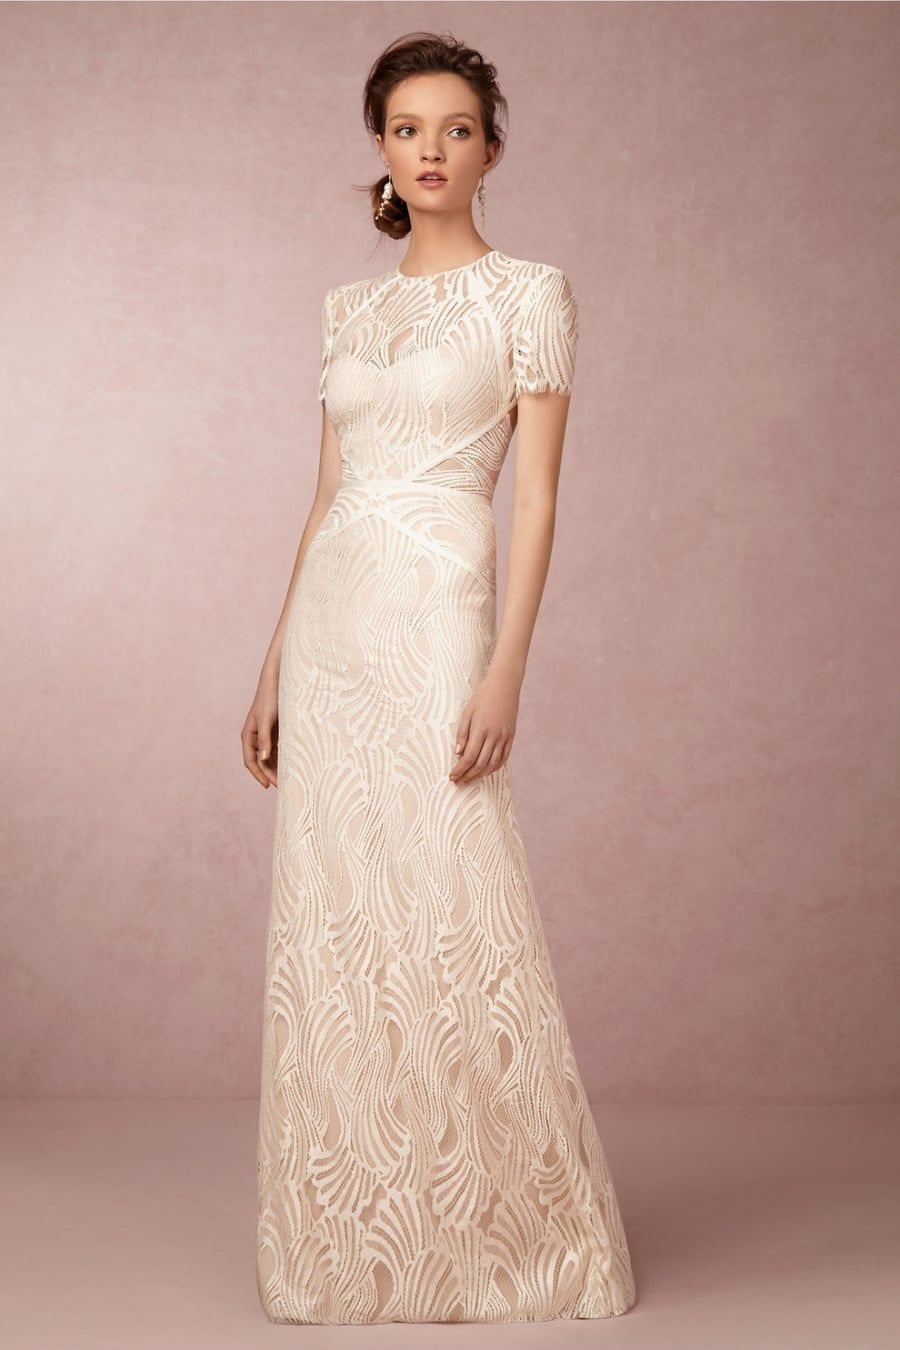 Ivory wedding dresses with sleeves   Wedding Dresses That Stun From   Wedding  Pinterest